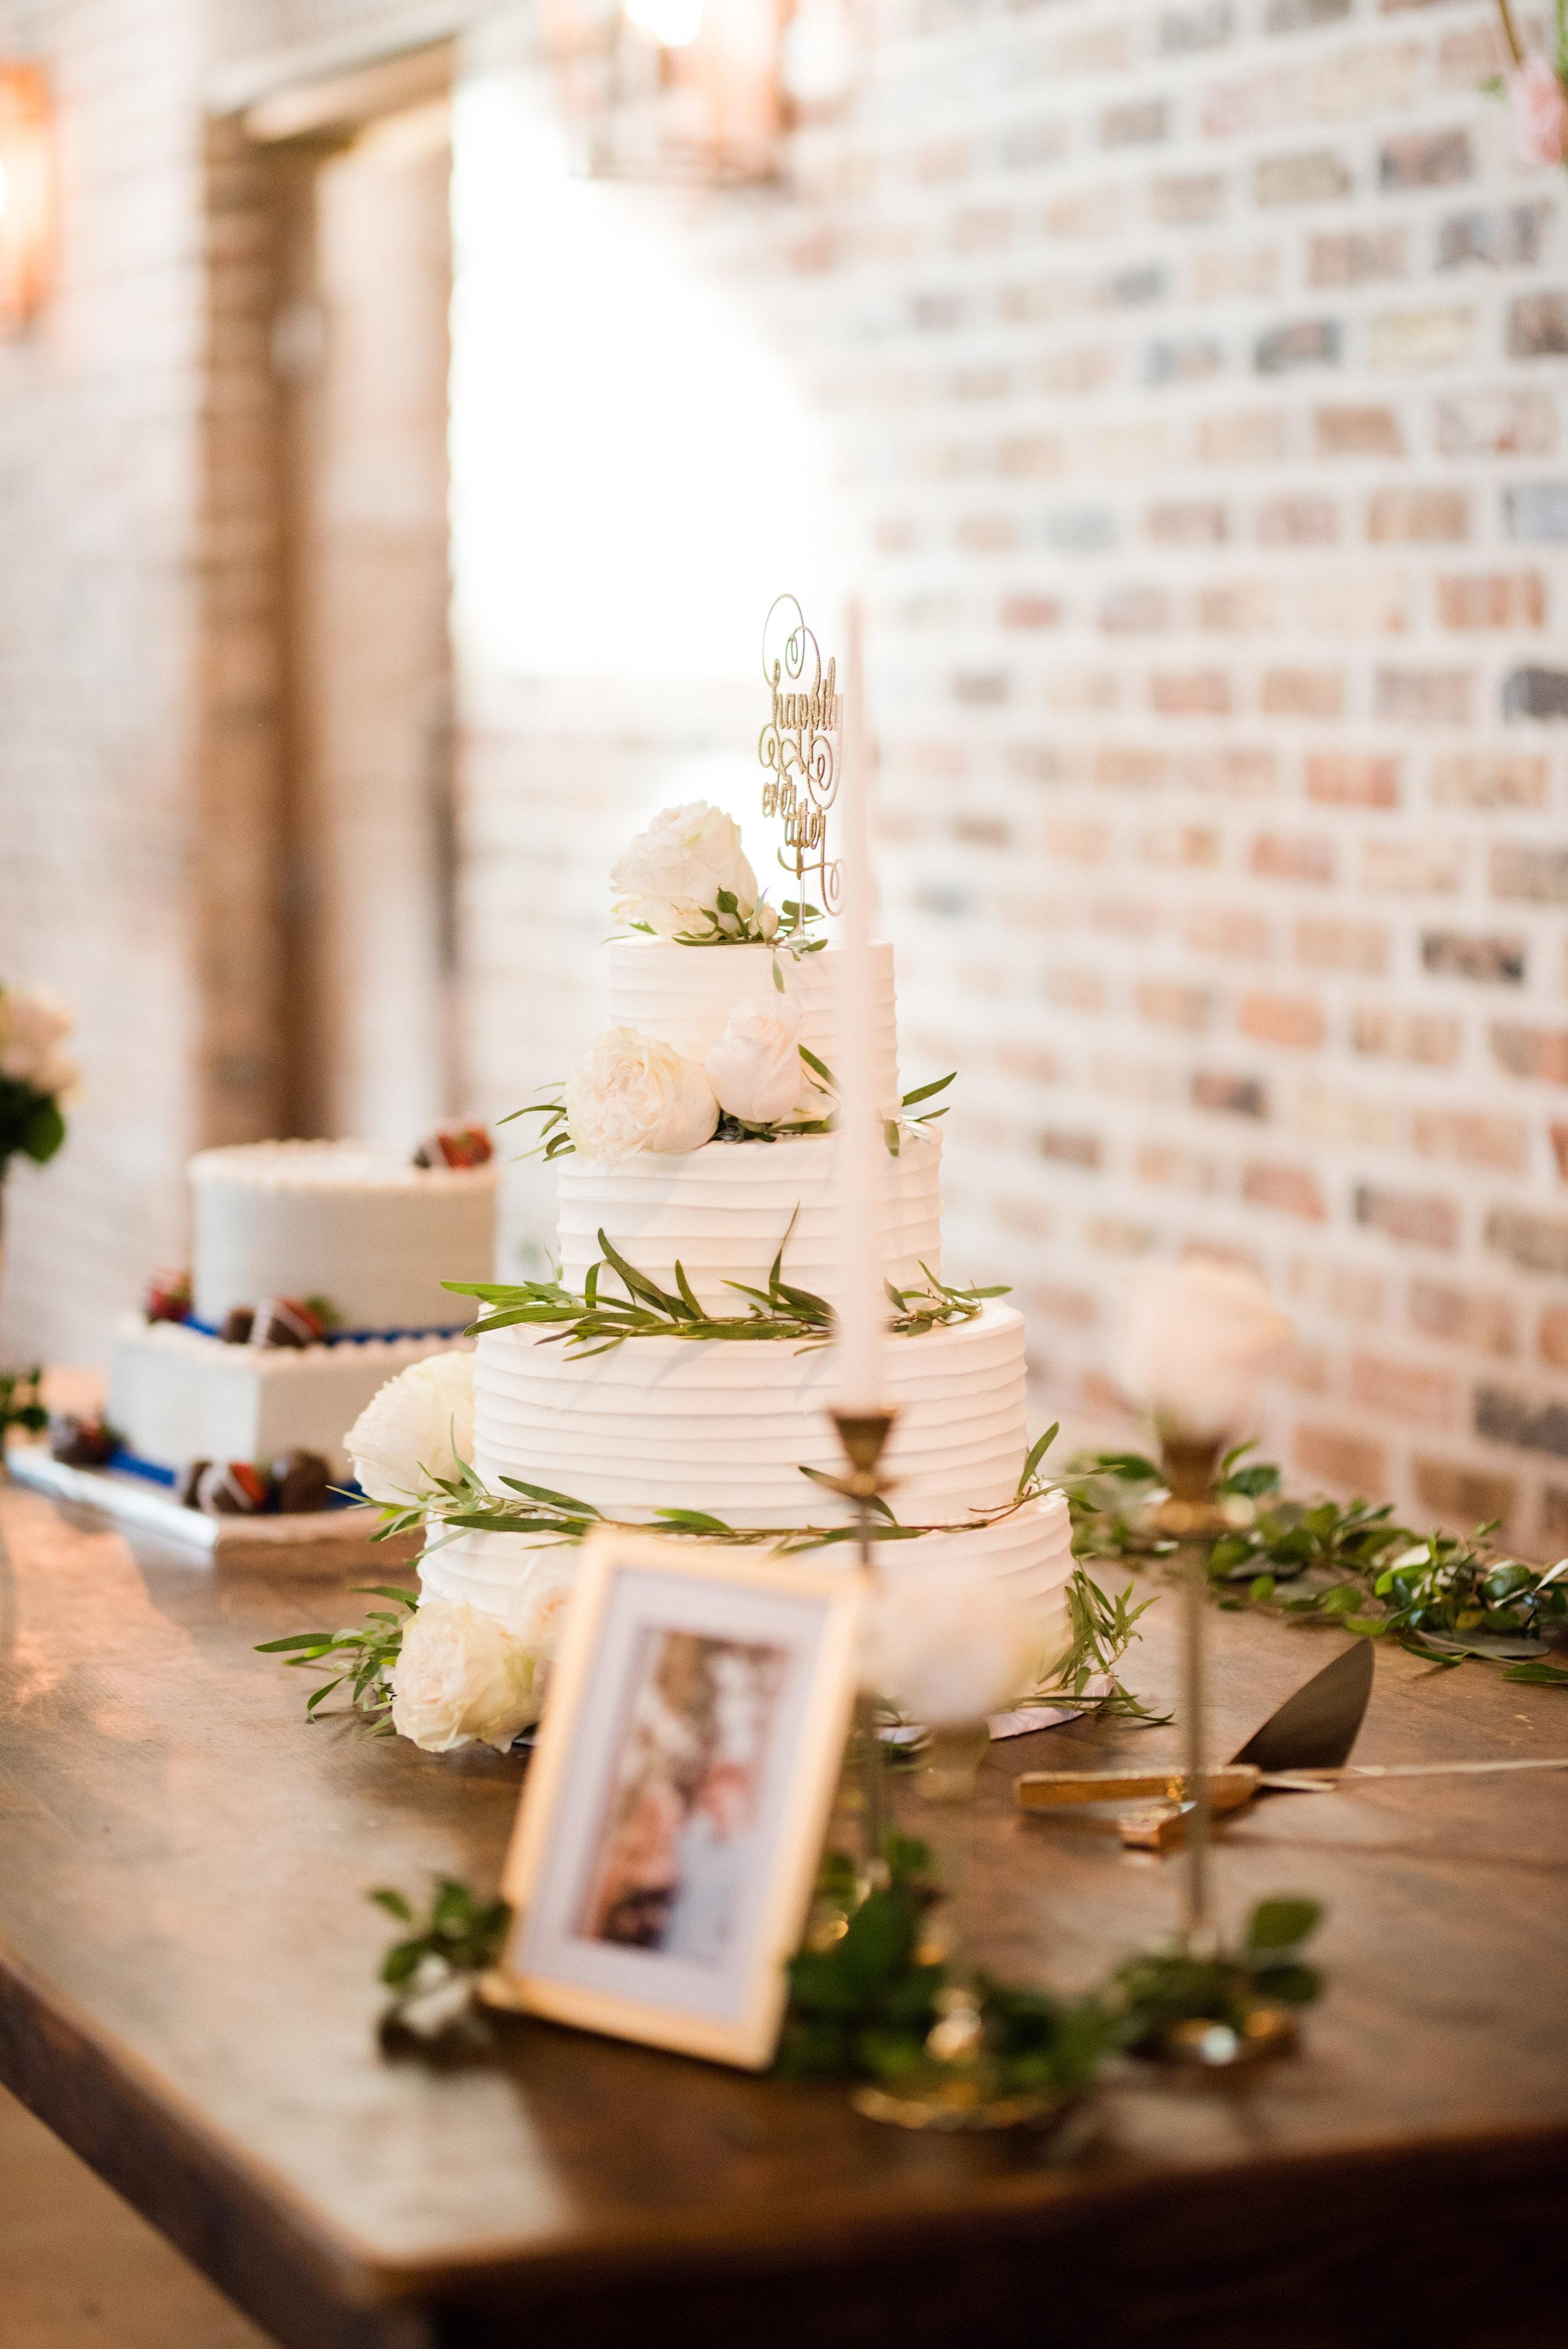 The Barn at Bridlewood wedding in Hattiesburg, Mississippi (MS) in June |  Wedding Cake